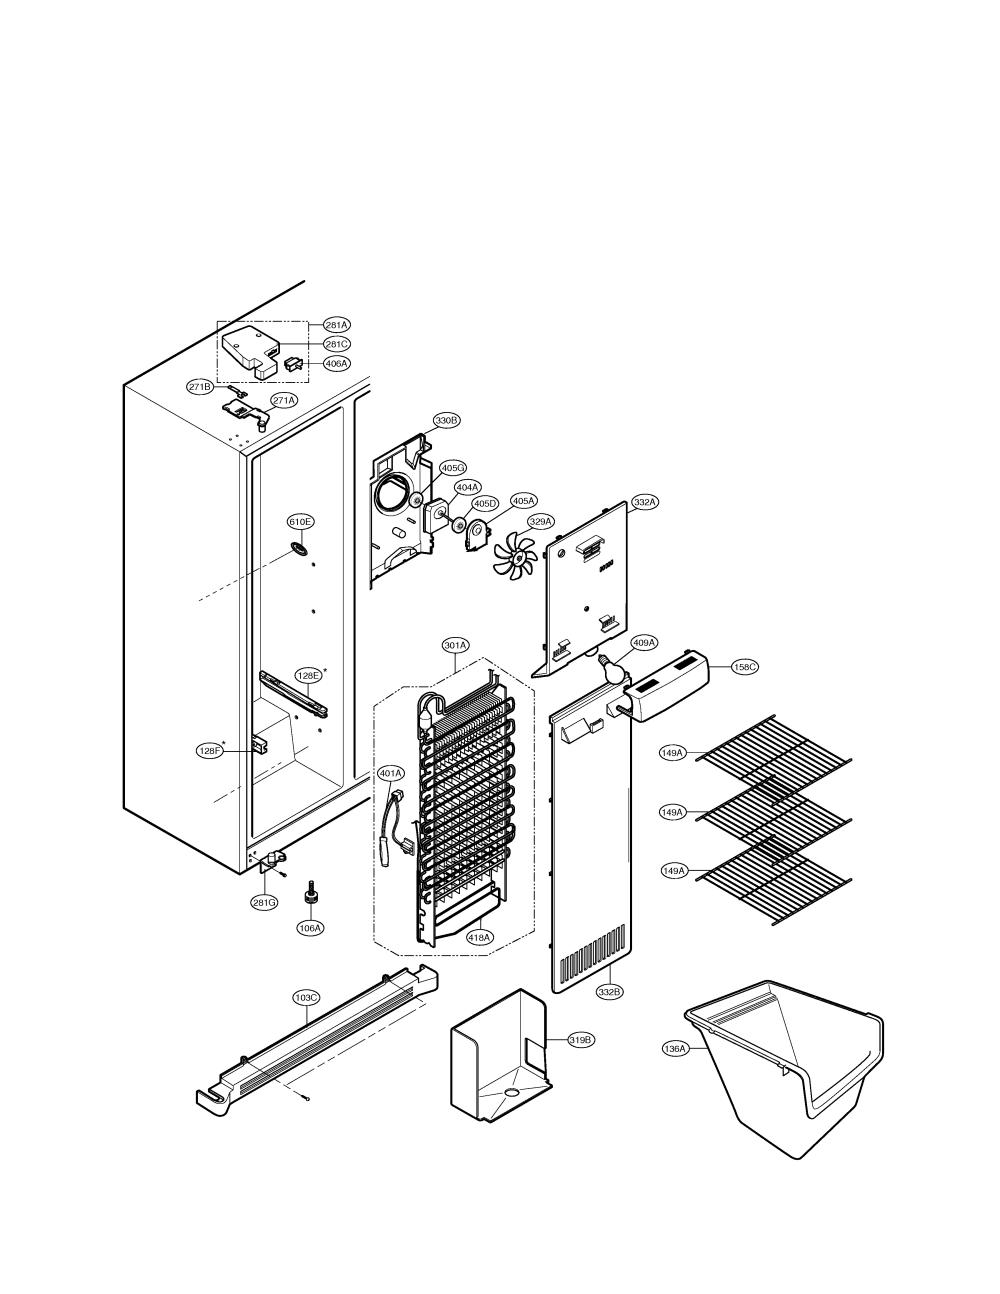 medium resolution of lg model lsc27910st side by side refrigerator genuine parts lg diagram refrigerator gm t56900vc lg refrigerator diagrams